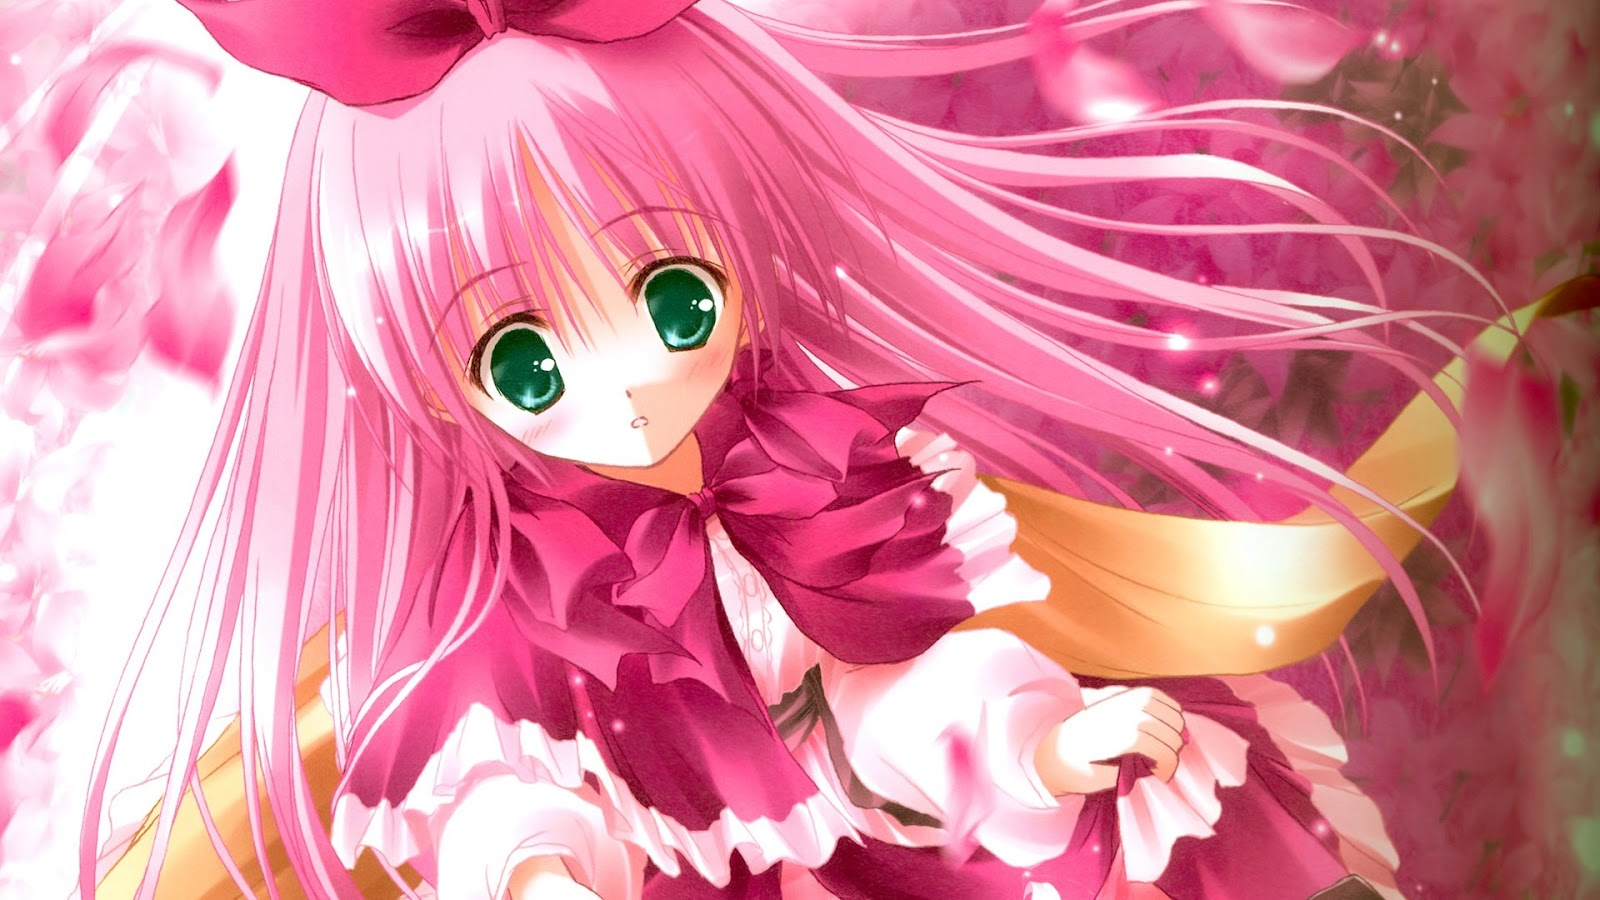 http://4.bp.blogspot.com/-y9yBVWuD3ig/T5Y1YPyqsHI/AAAAAAAADNE/g3pXXpQ7gRI/s1600/Girl+Anime+Wallpaper+5.jpg